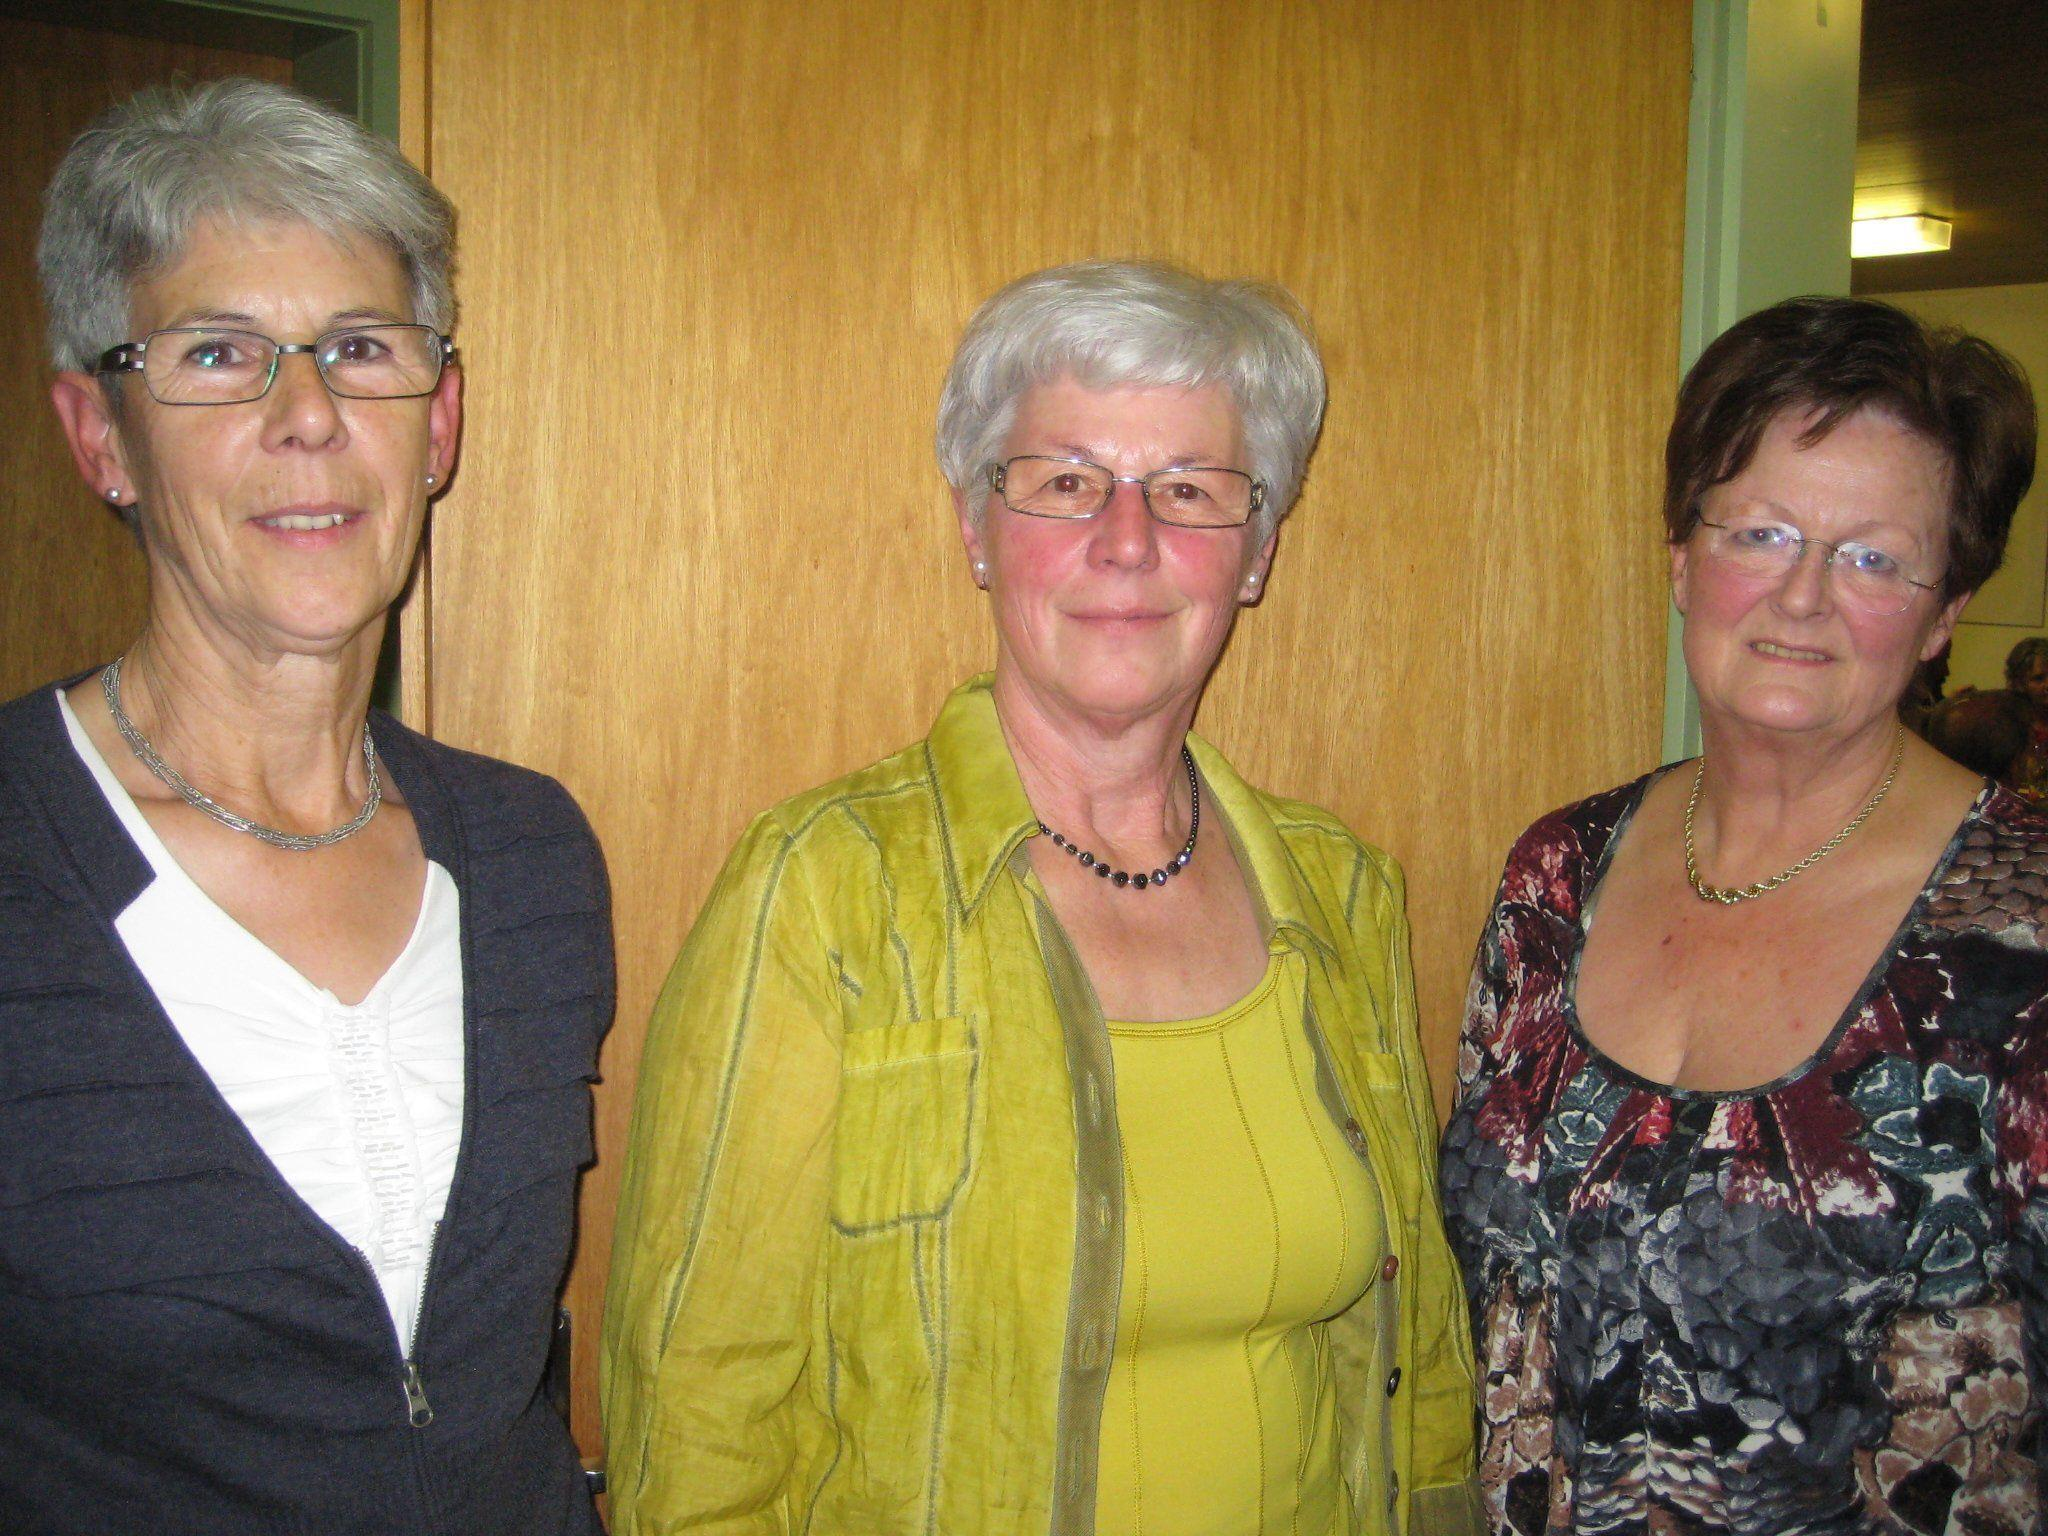 Gusti Giesinger, Rita Müller und Friedl Haueis